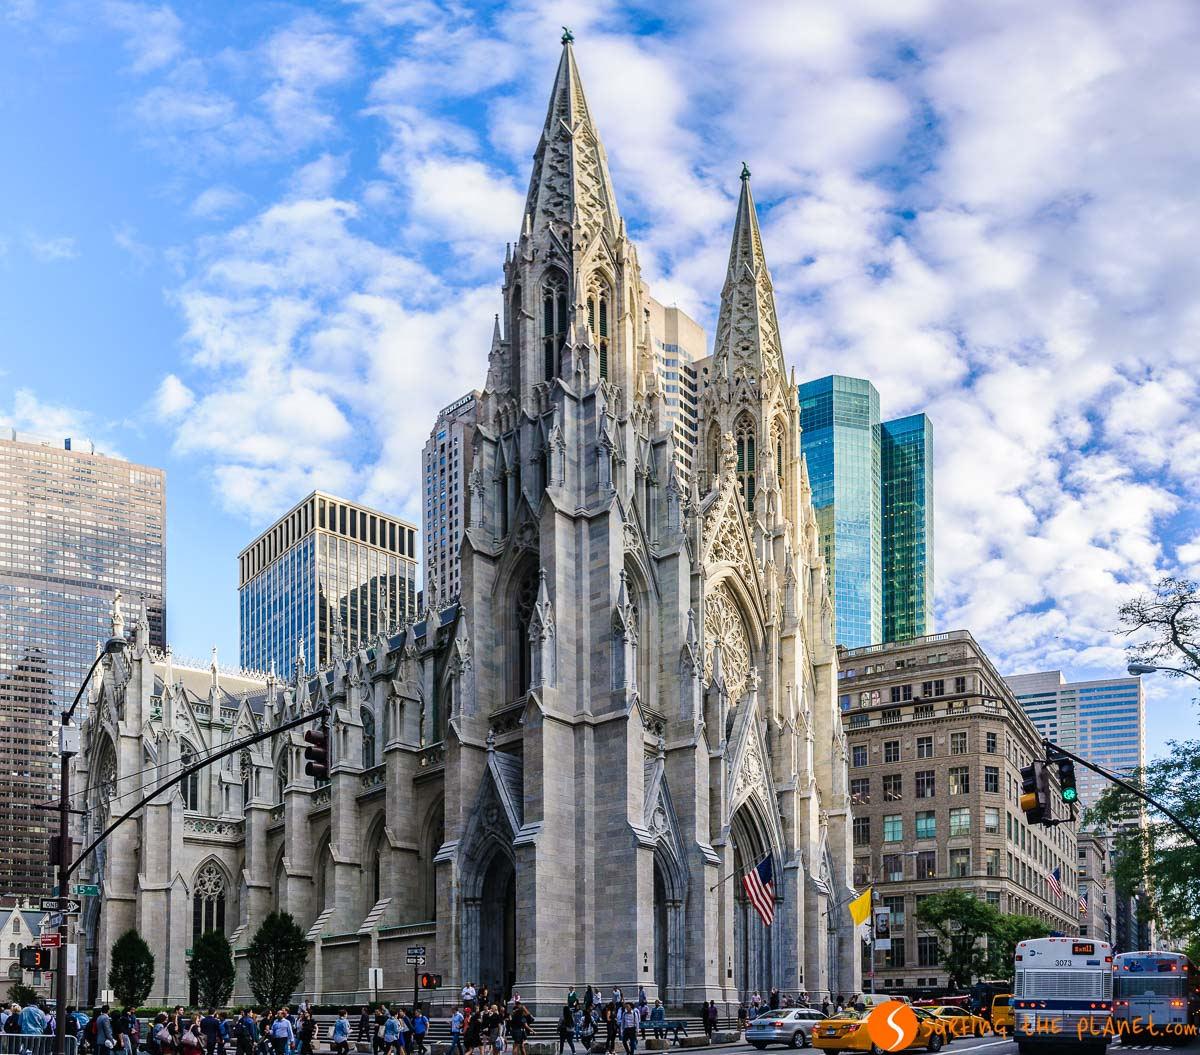 Catedral San Patricio, Midtown, Nueva York, Estados Unidos | Qué ver en Midtown Nueva York en 1 día